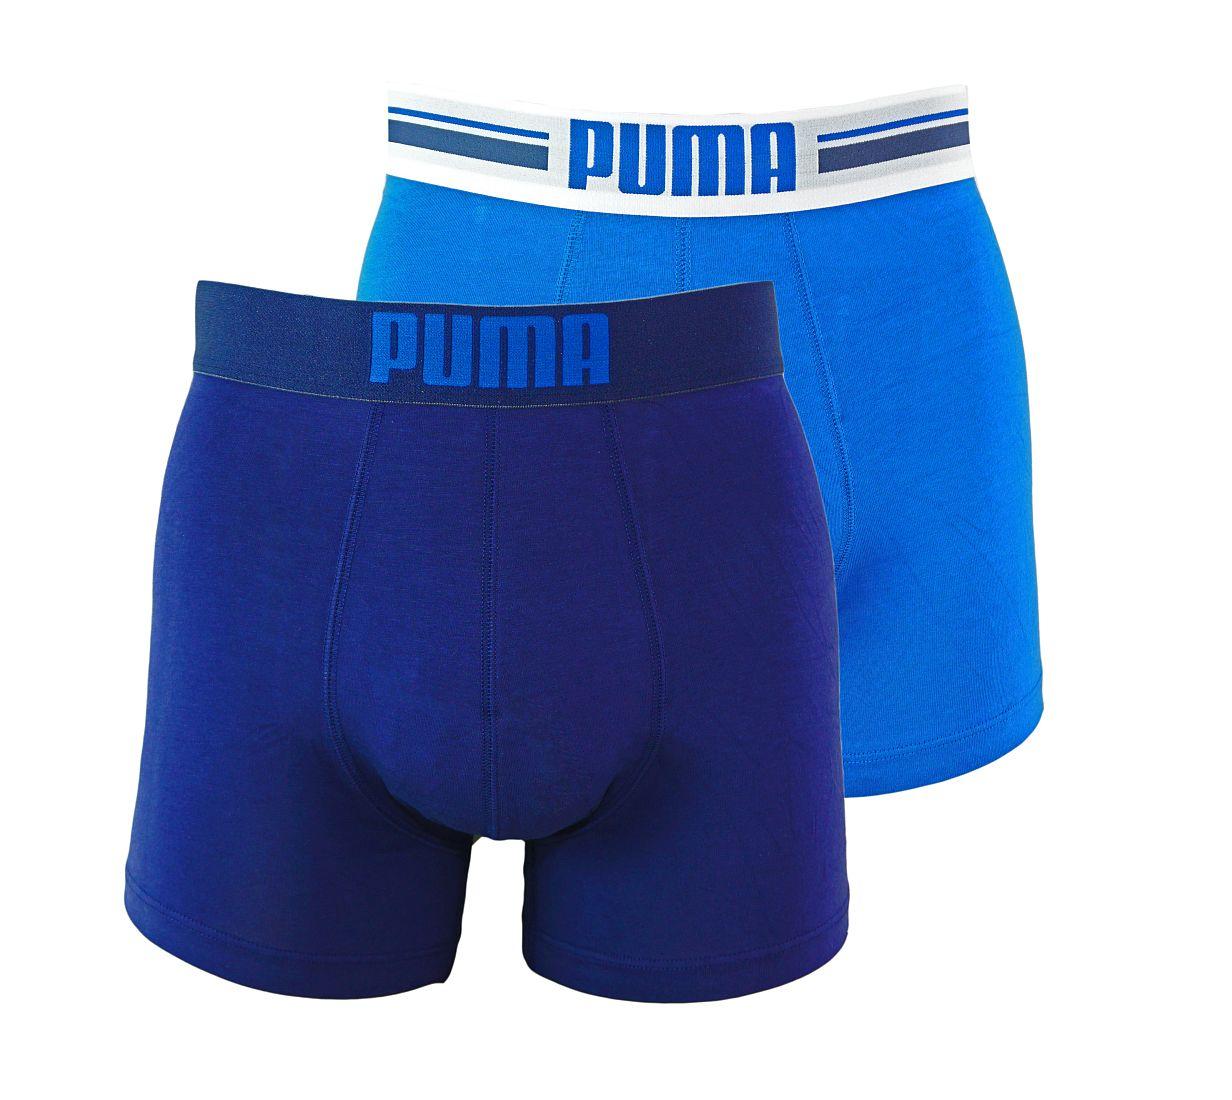 PUMA Shorts Unterhosen 2er Pack Boxer 651003001 056 020 blue SF17-PMS1